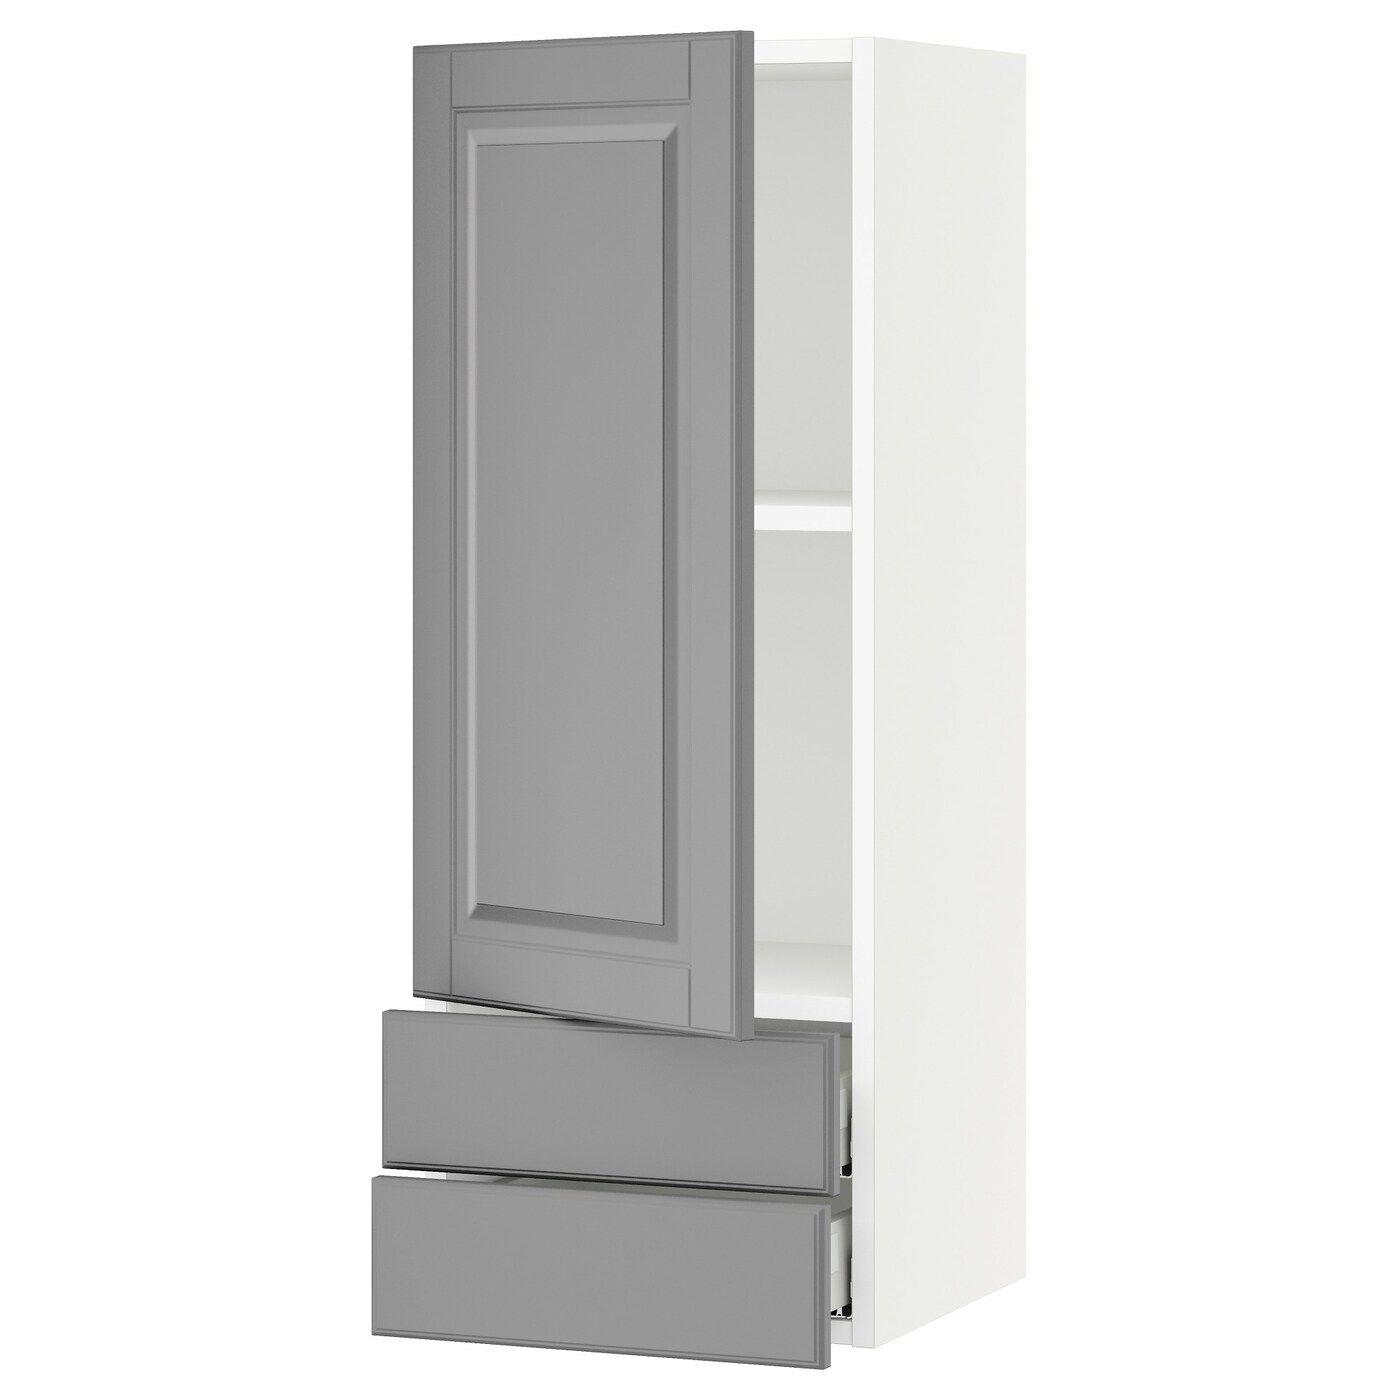 Ikea Sektion Maximera White Bodbyn Gray Wall Cabinet With Door 2 Drawers In 2020 Cabinet Doors Bathroom Wall Cabinets Ikea